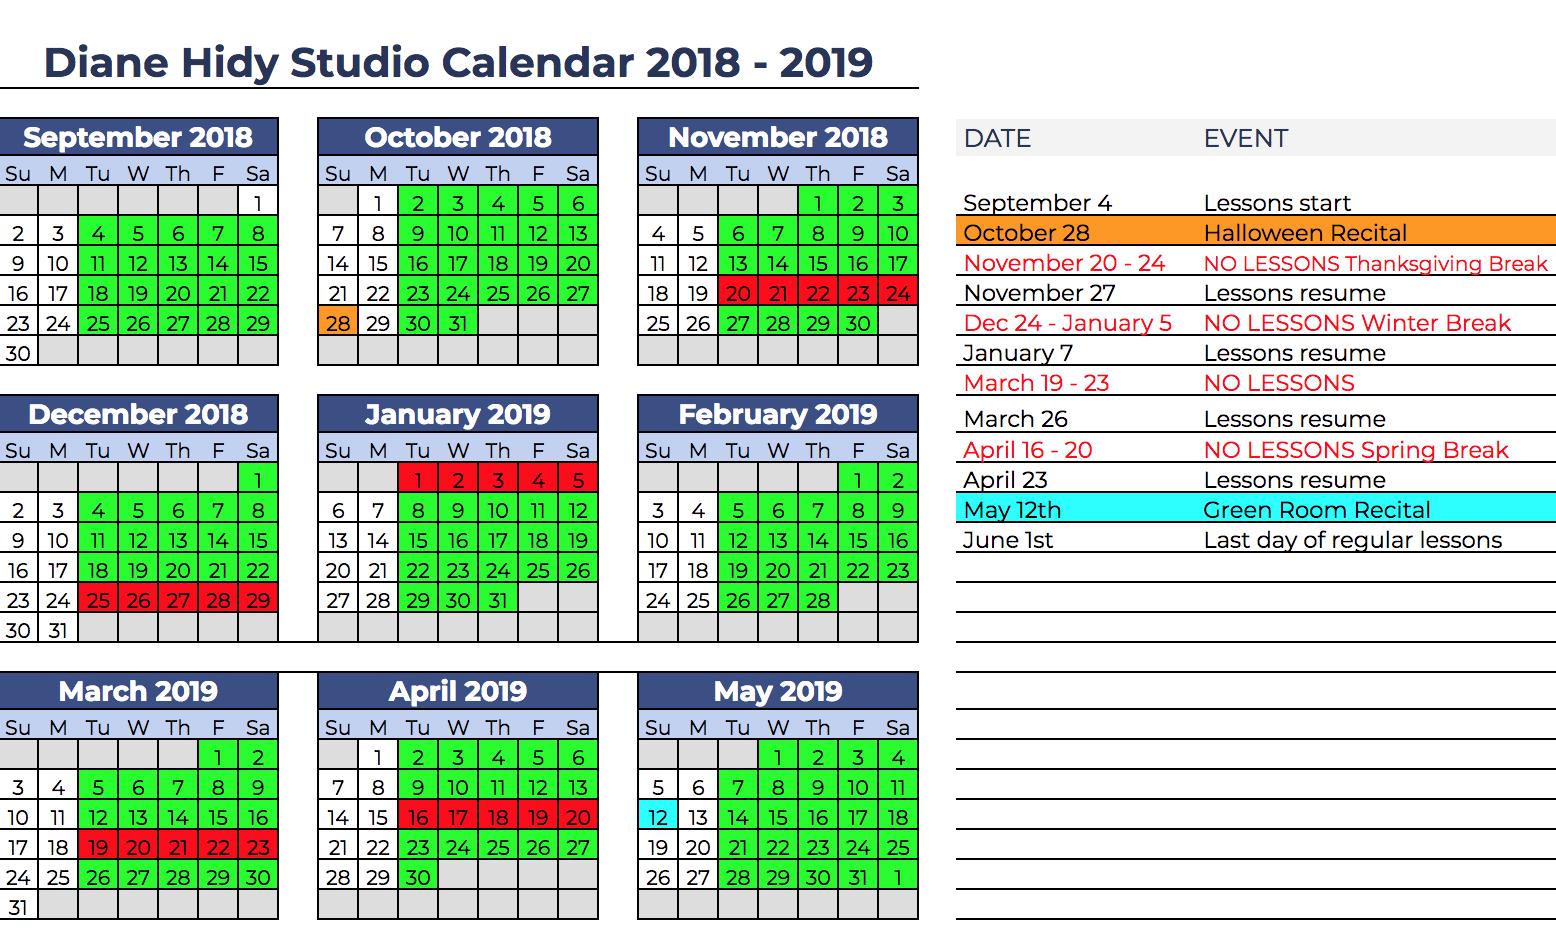 Diane Hidy Studio Calendar 2018-2019 Google version.png